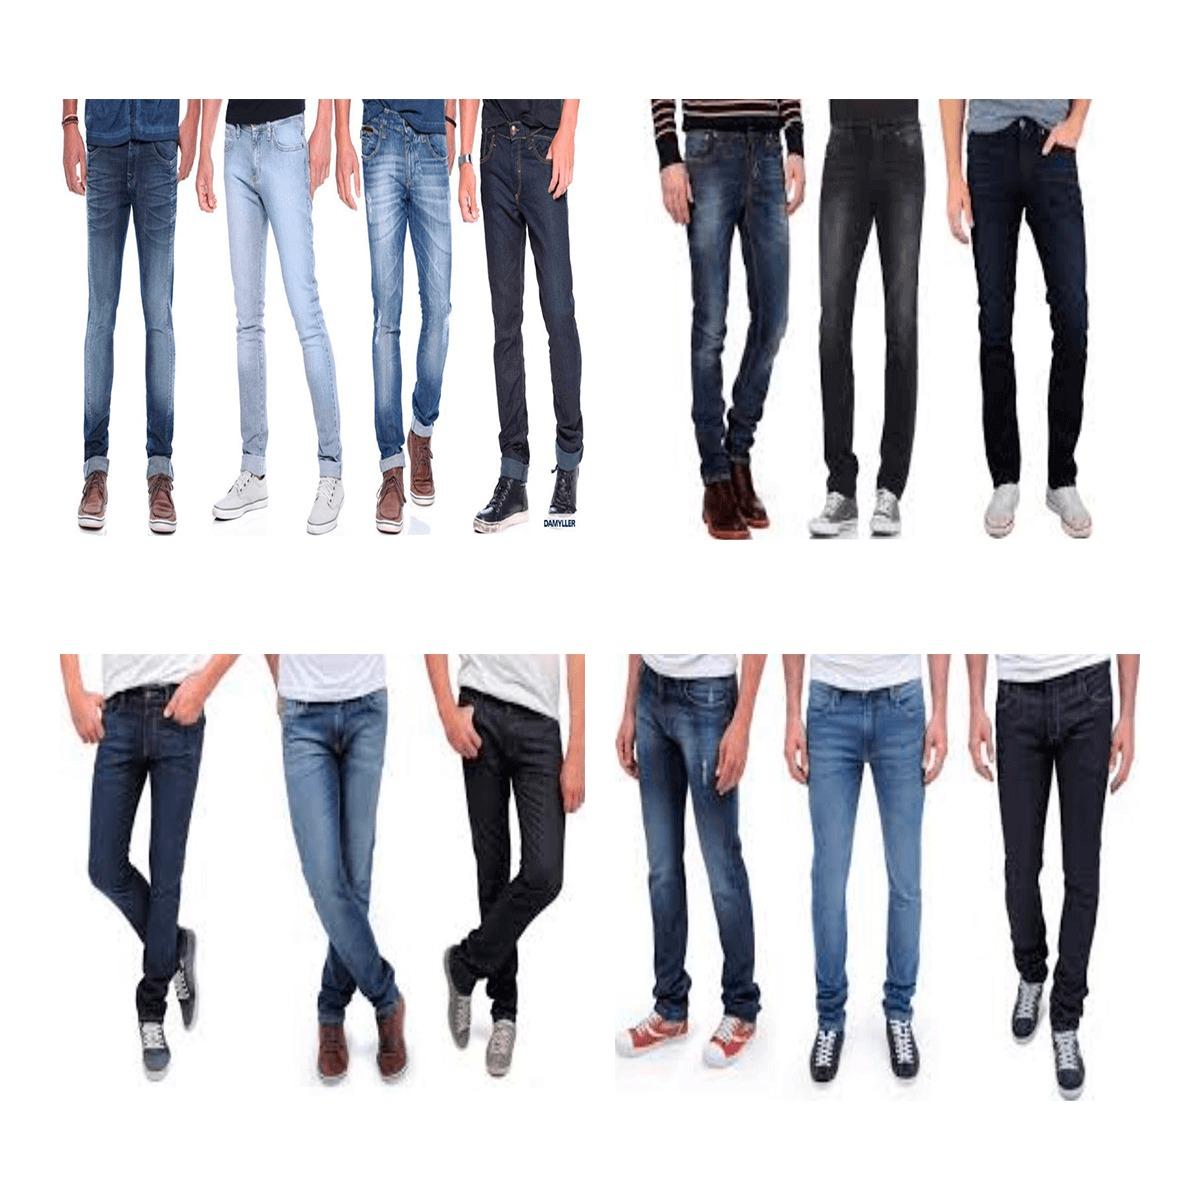 d83d5031433f31 Kit 2 Calça Jeans Masculina De Marca Slim Skinny Top Revenda